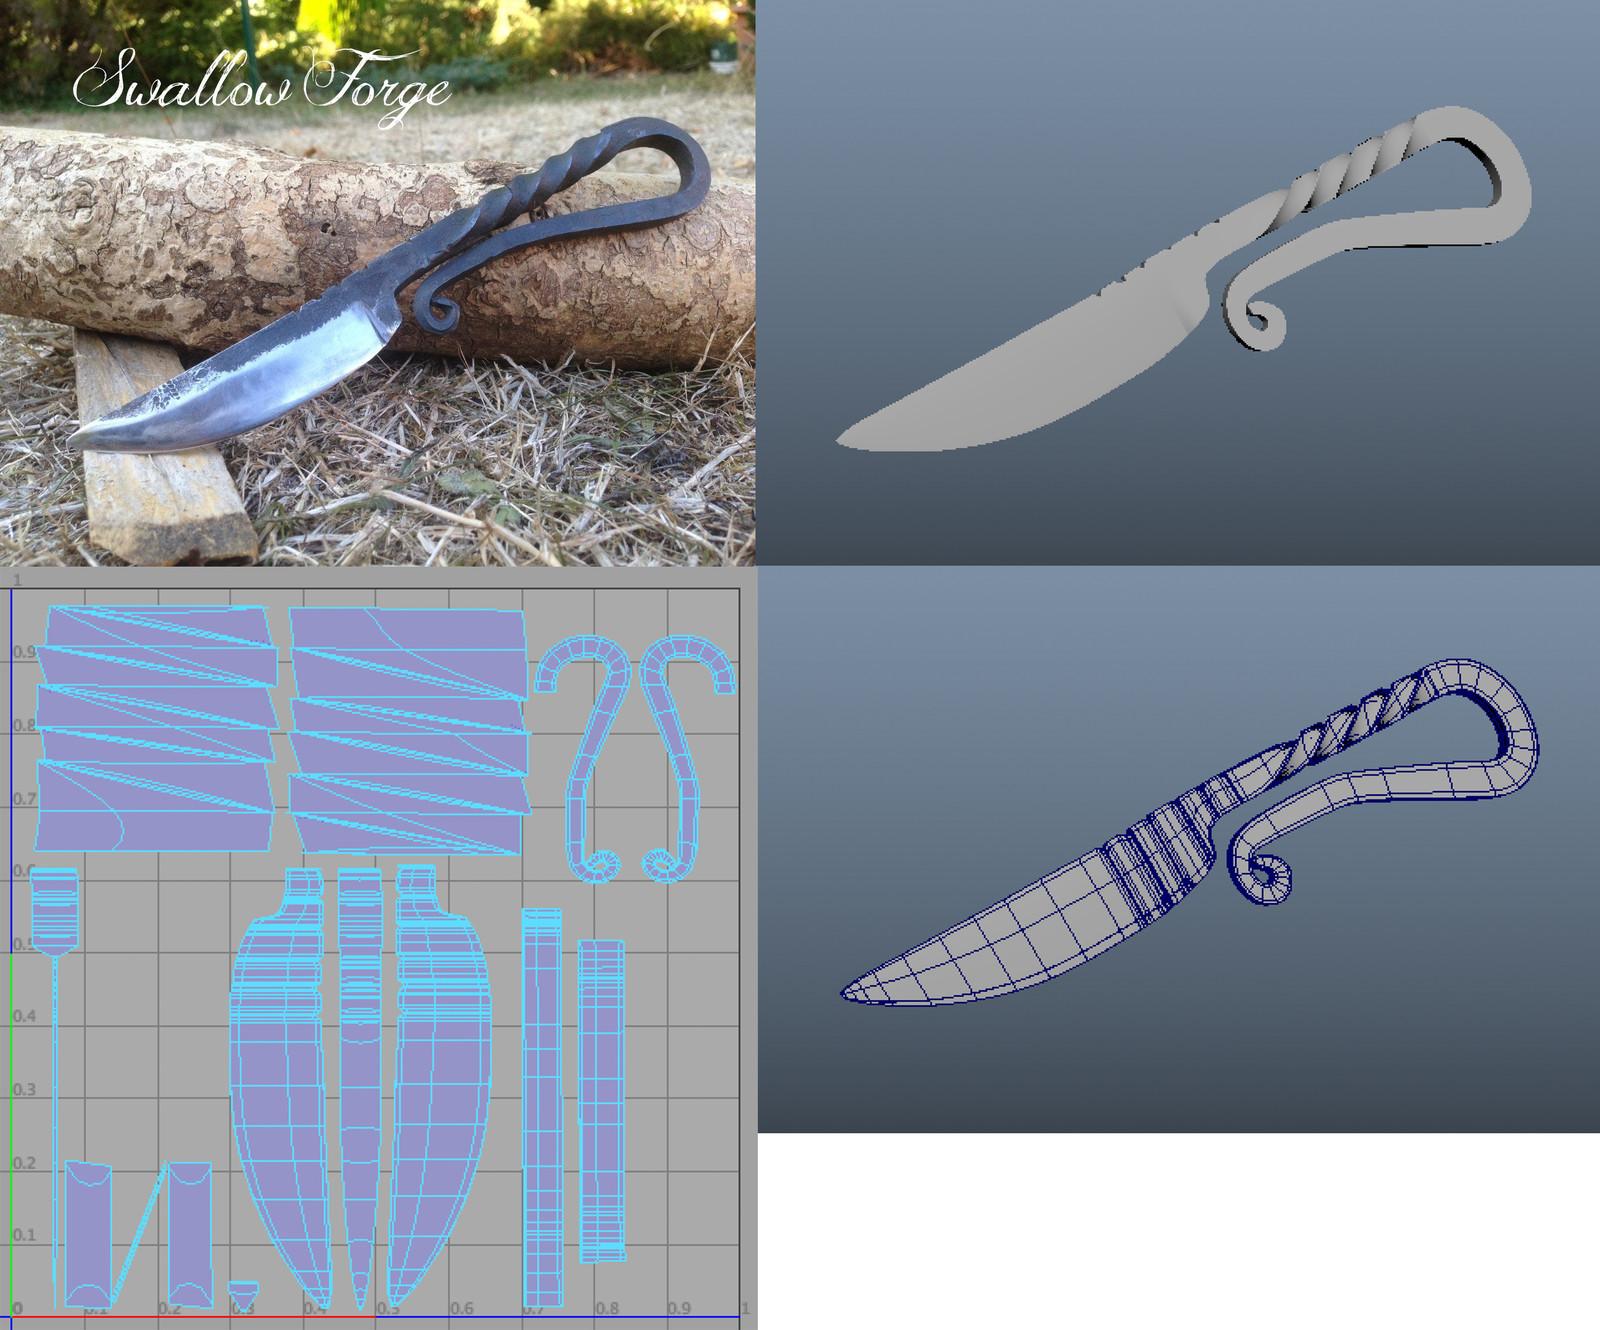 'Knife' with UVs